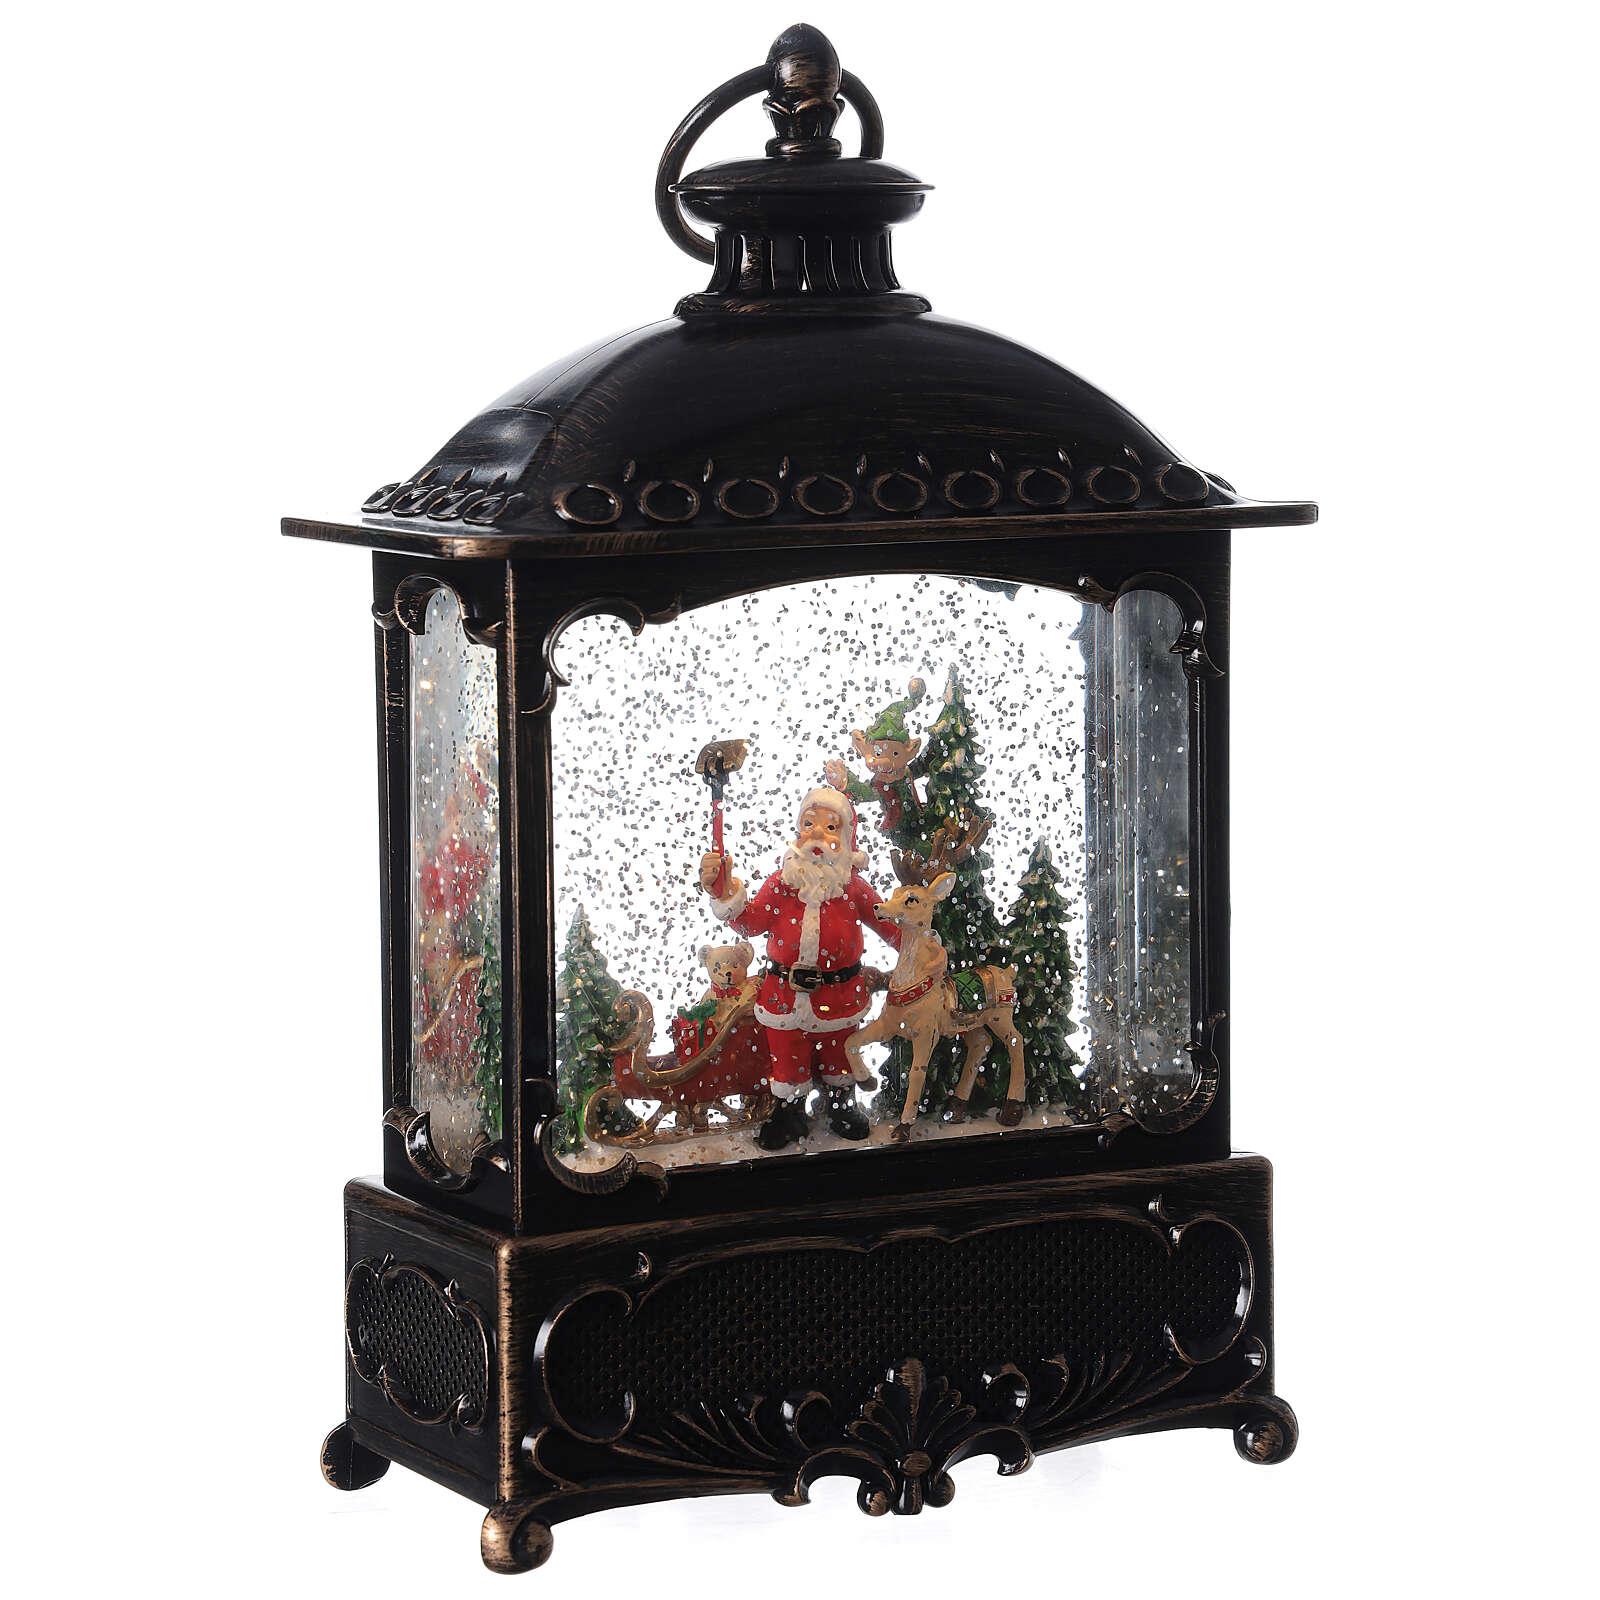 Square lantern snow globe Santa Claus LED 30x20x10 cm 3